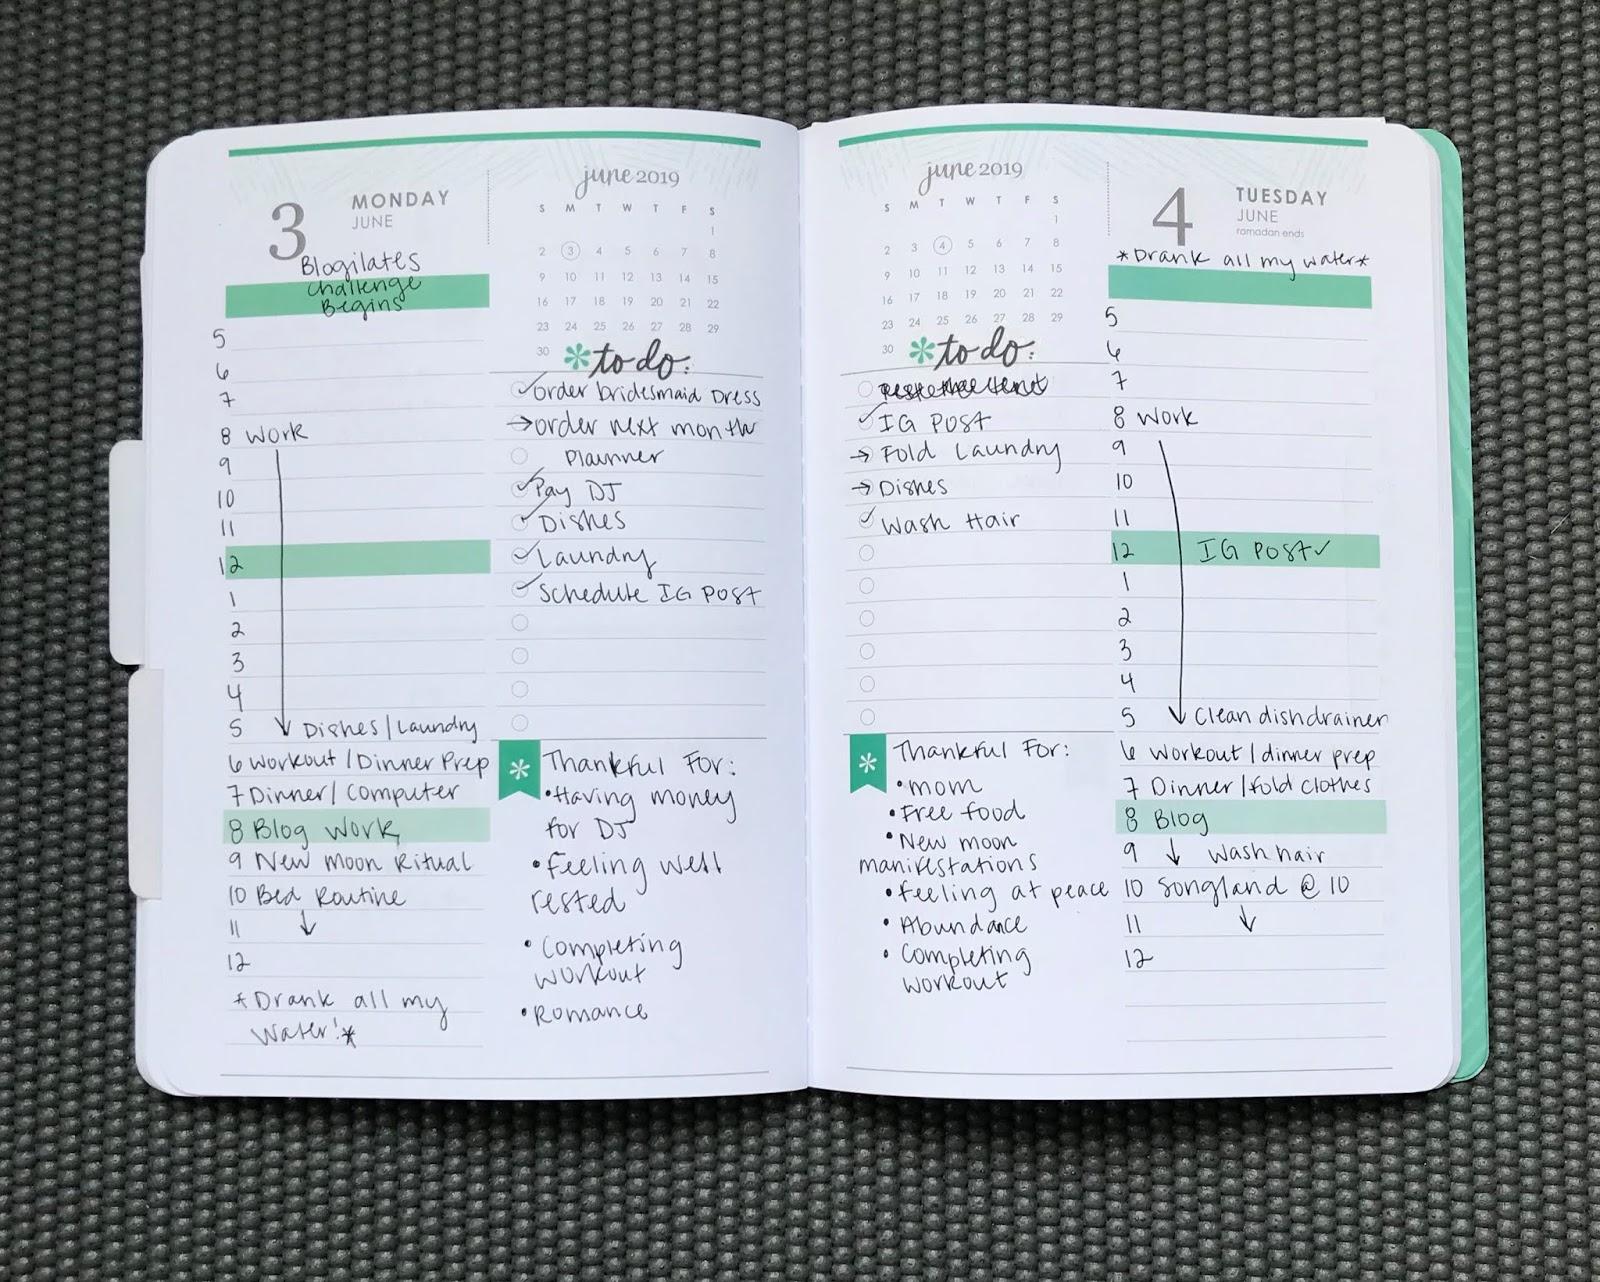 Happy Planner Erin Condren Agenda Calendar Meal Prep Planner Sticker